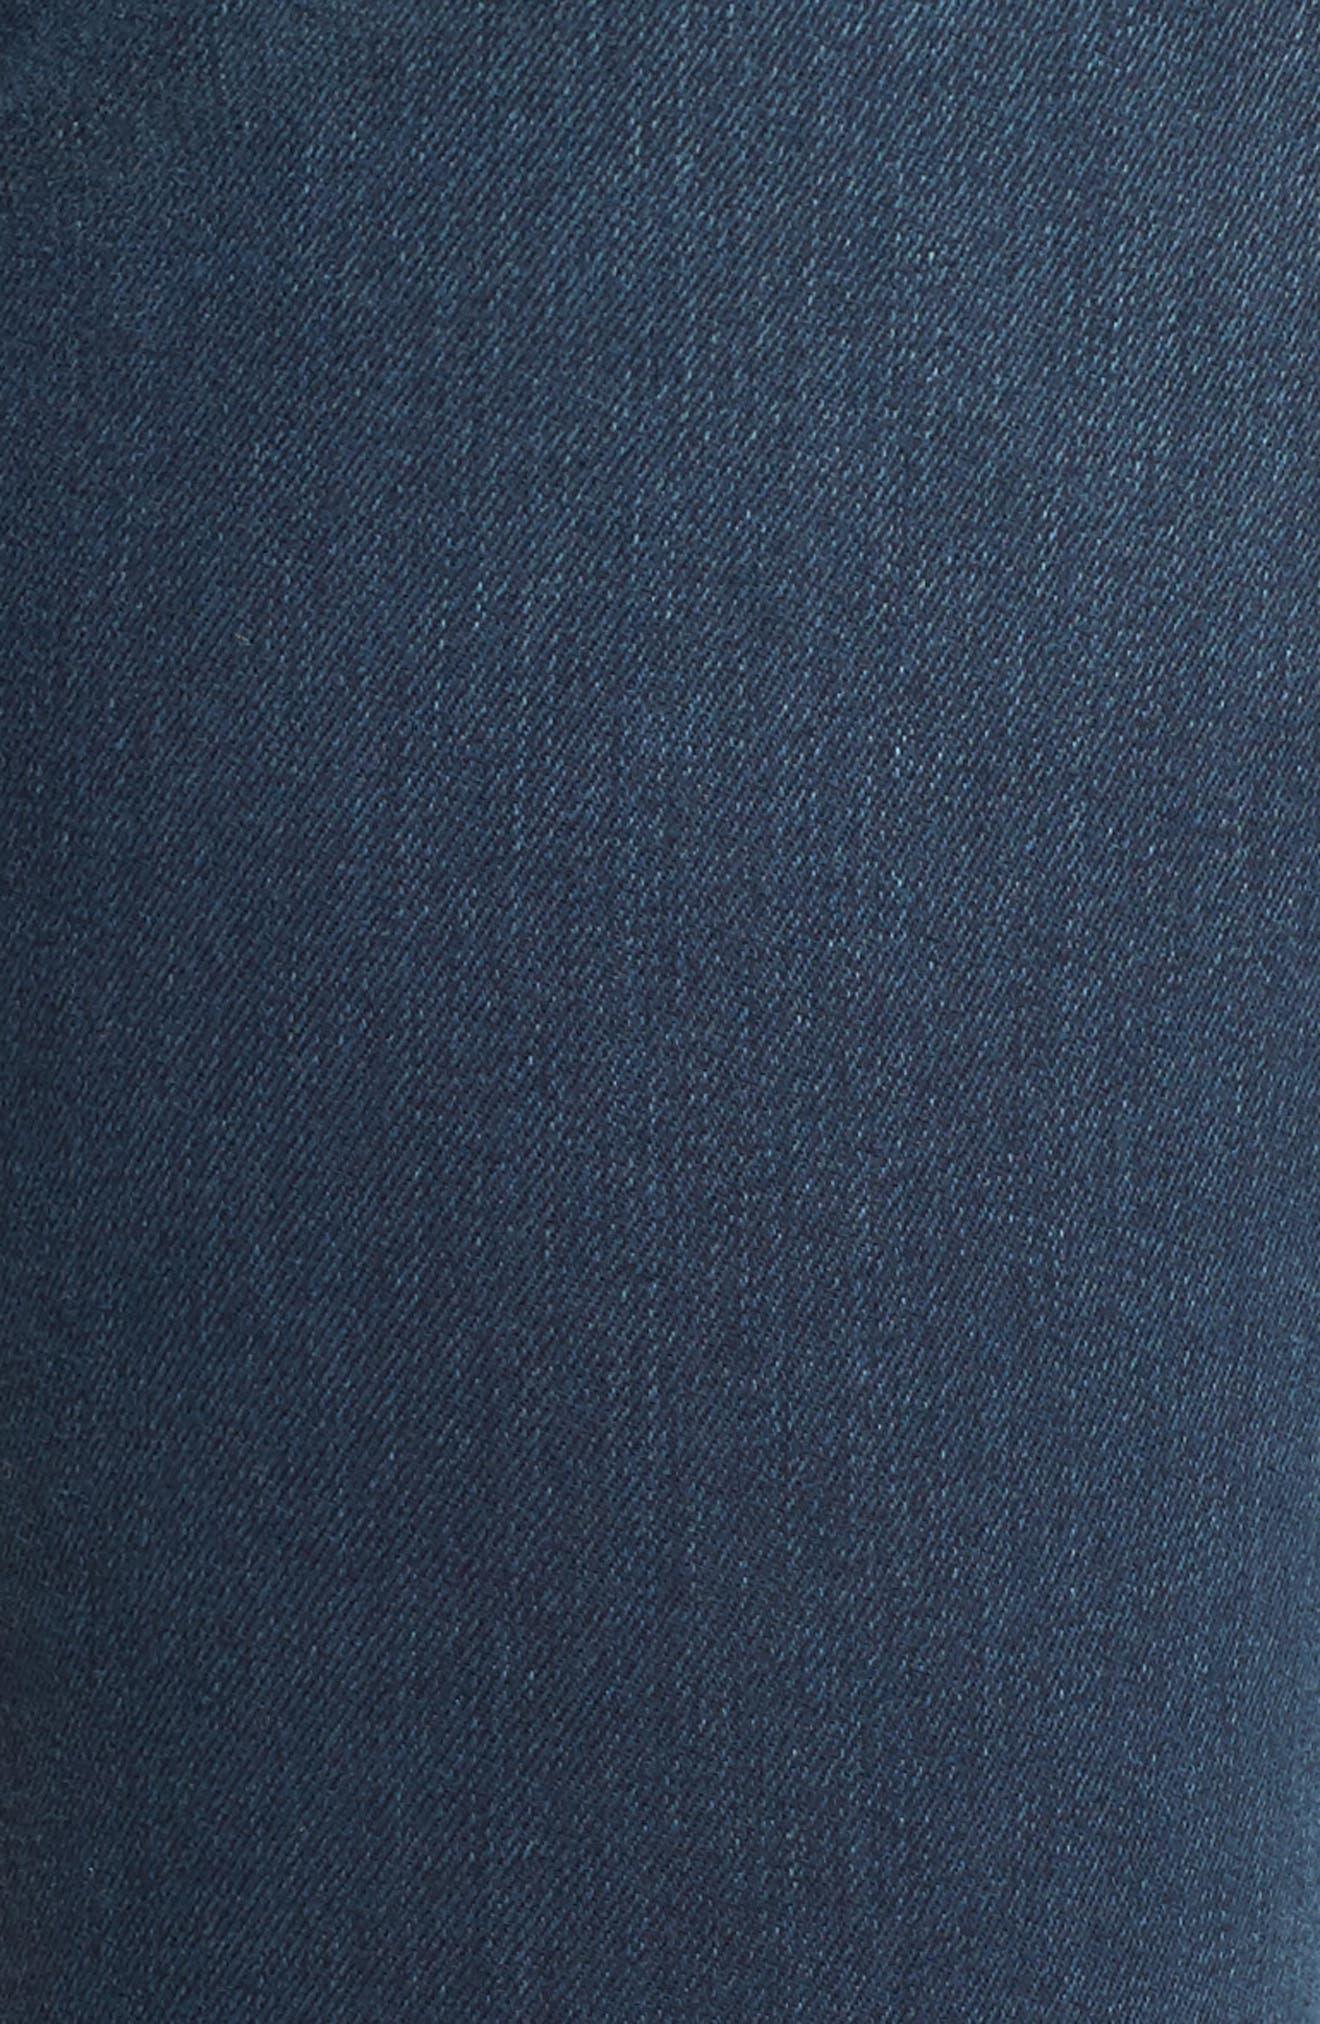 Alternate Image 5  - NYDJ Ami Stretch Super Skinny Jeans (Rome) (Regular & Petite)